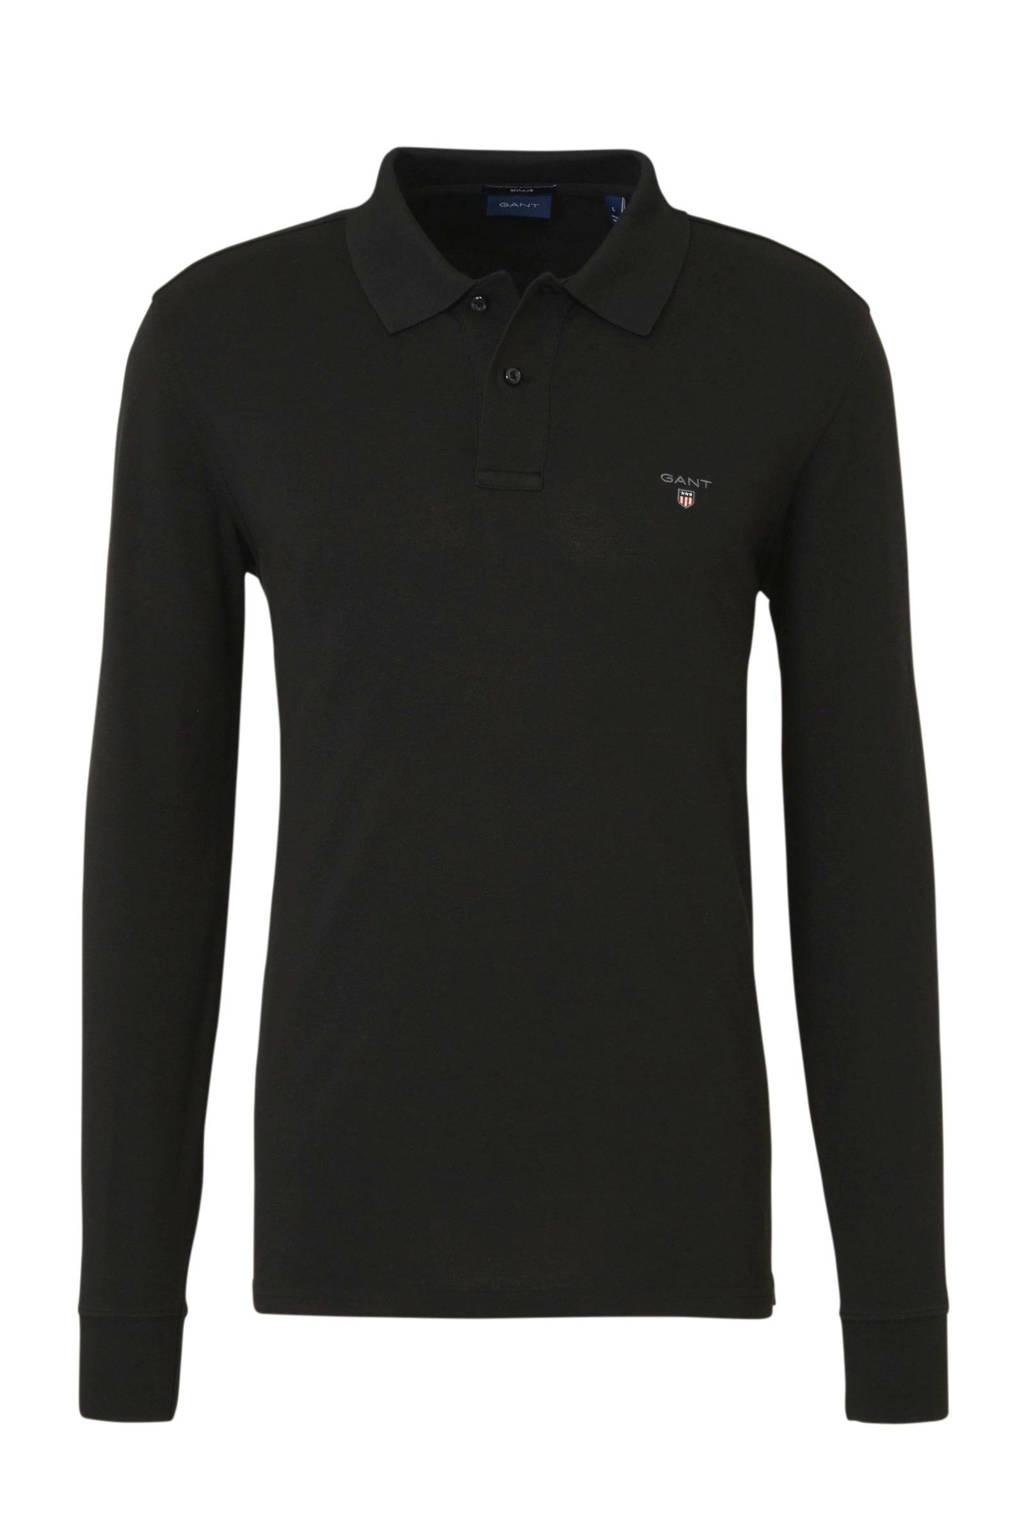 GANT regular fit polo met logo zwart, Zwart